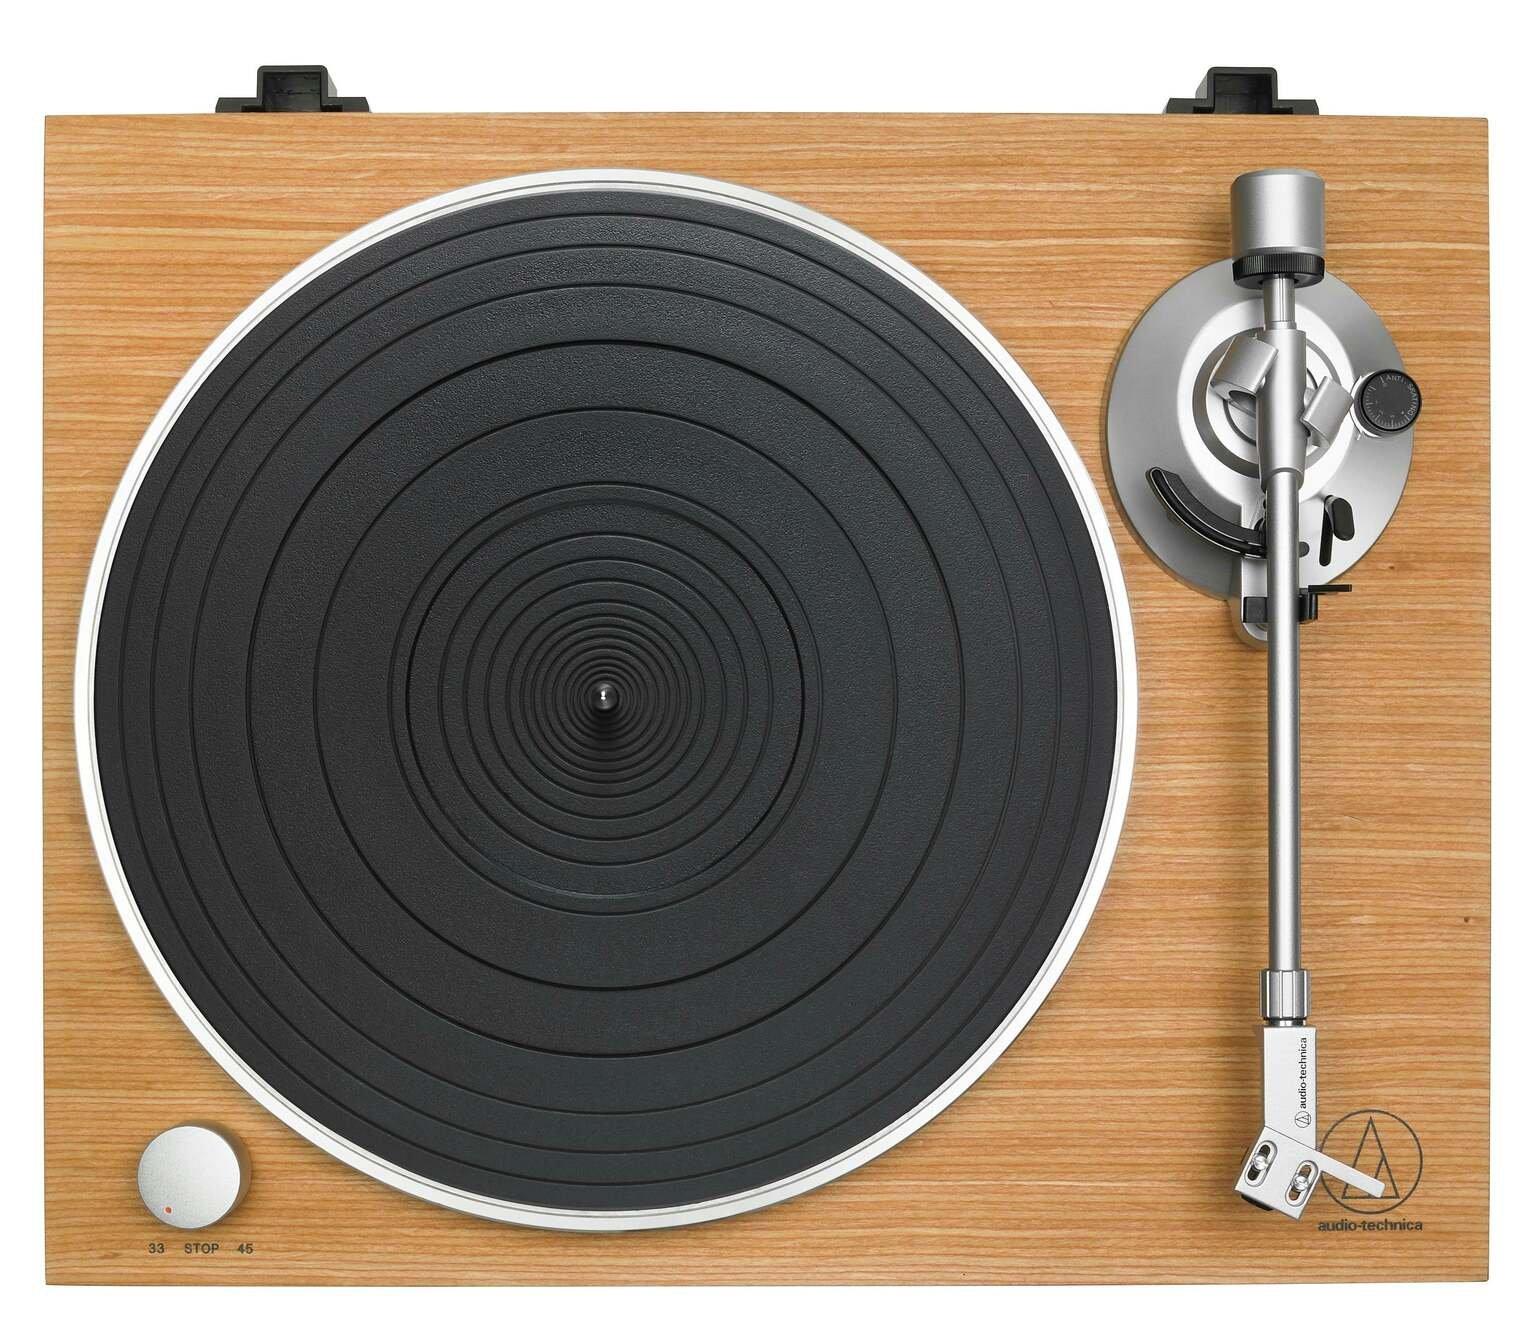 Audio-Technica AT-LPW30TK Manual Belt-Drive Turntable - Teak